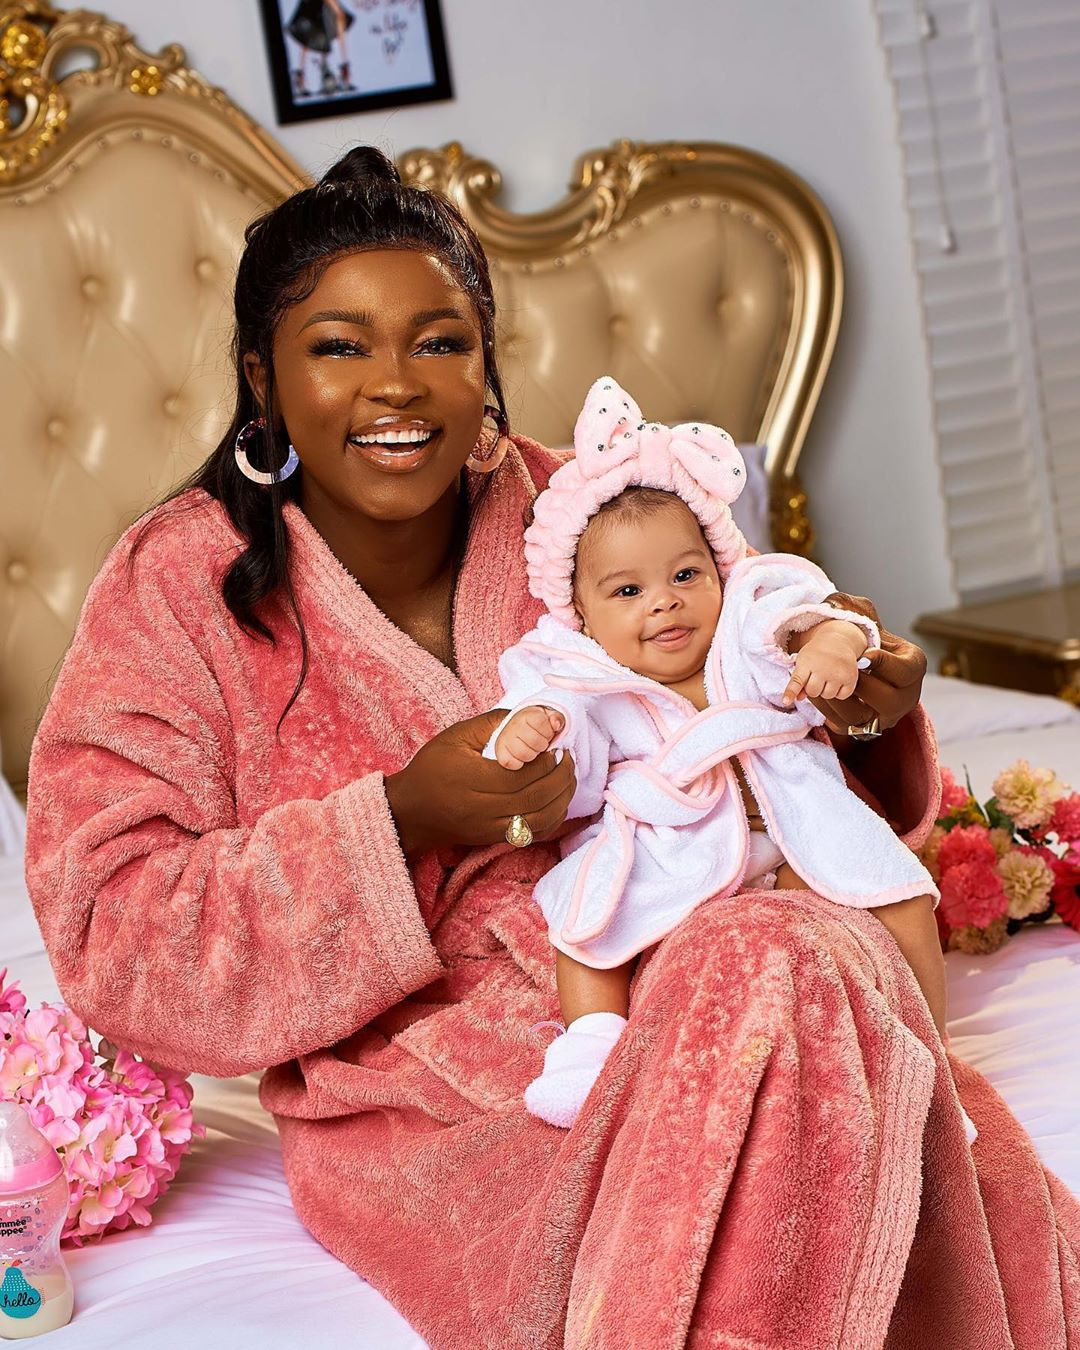 #BBNaija: See Photos Of Ka3na And Her Daughter